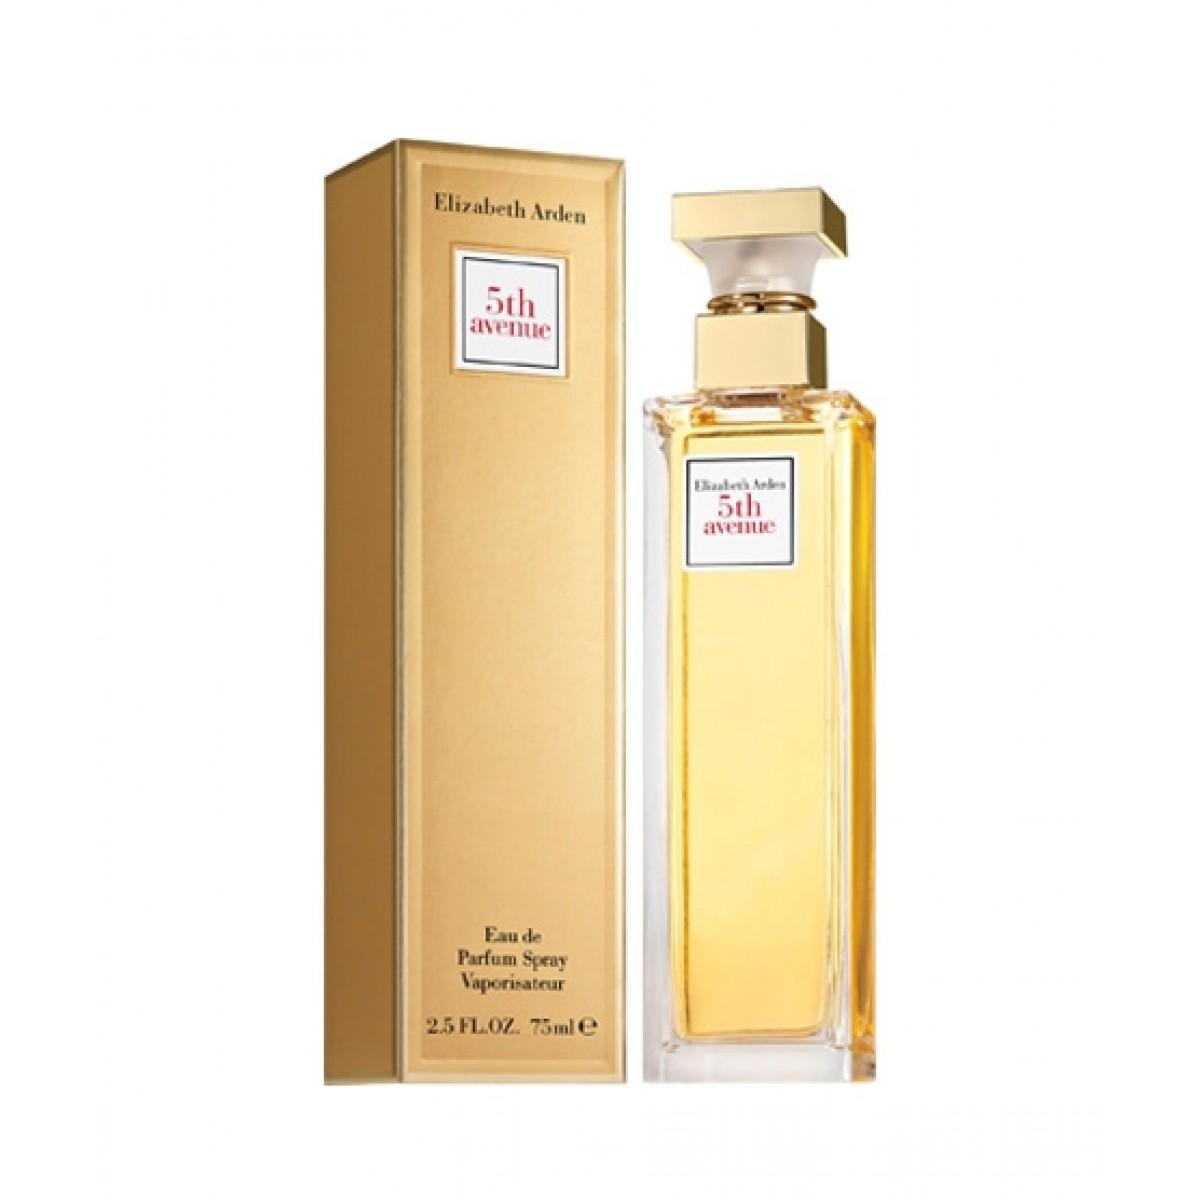 e3f2cd61b Elizabeth Arden 5th Avenue Eau De Parfum Price in Pakistan | Buy Elizabeth  Arden Eau De Parfum For Women 75ml | iShopping.pk